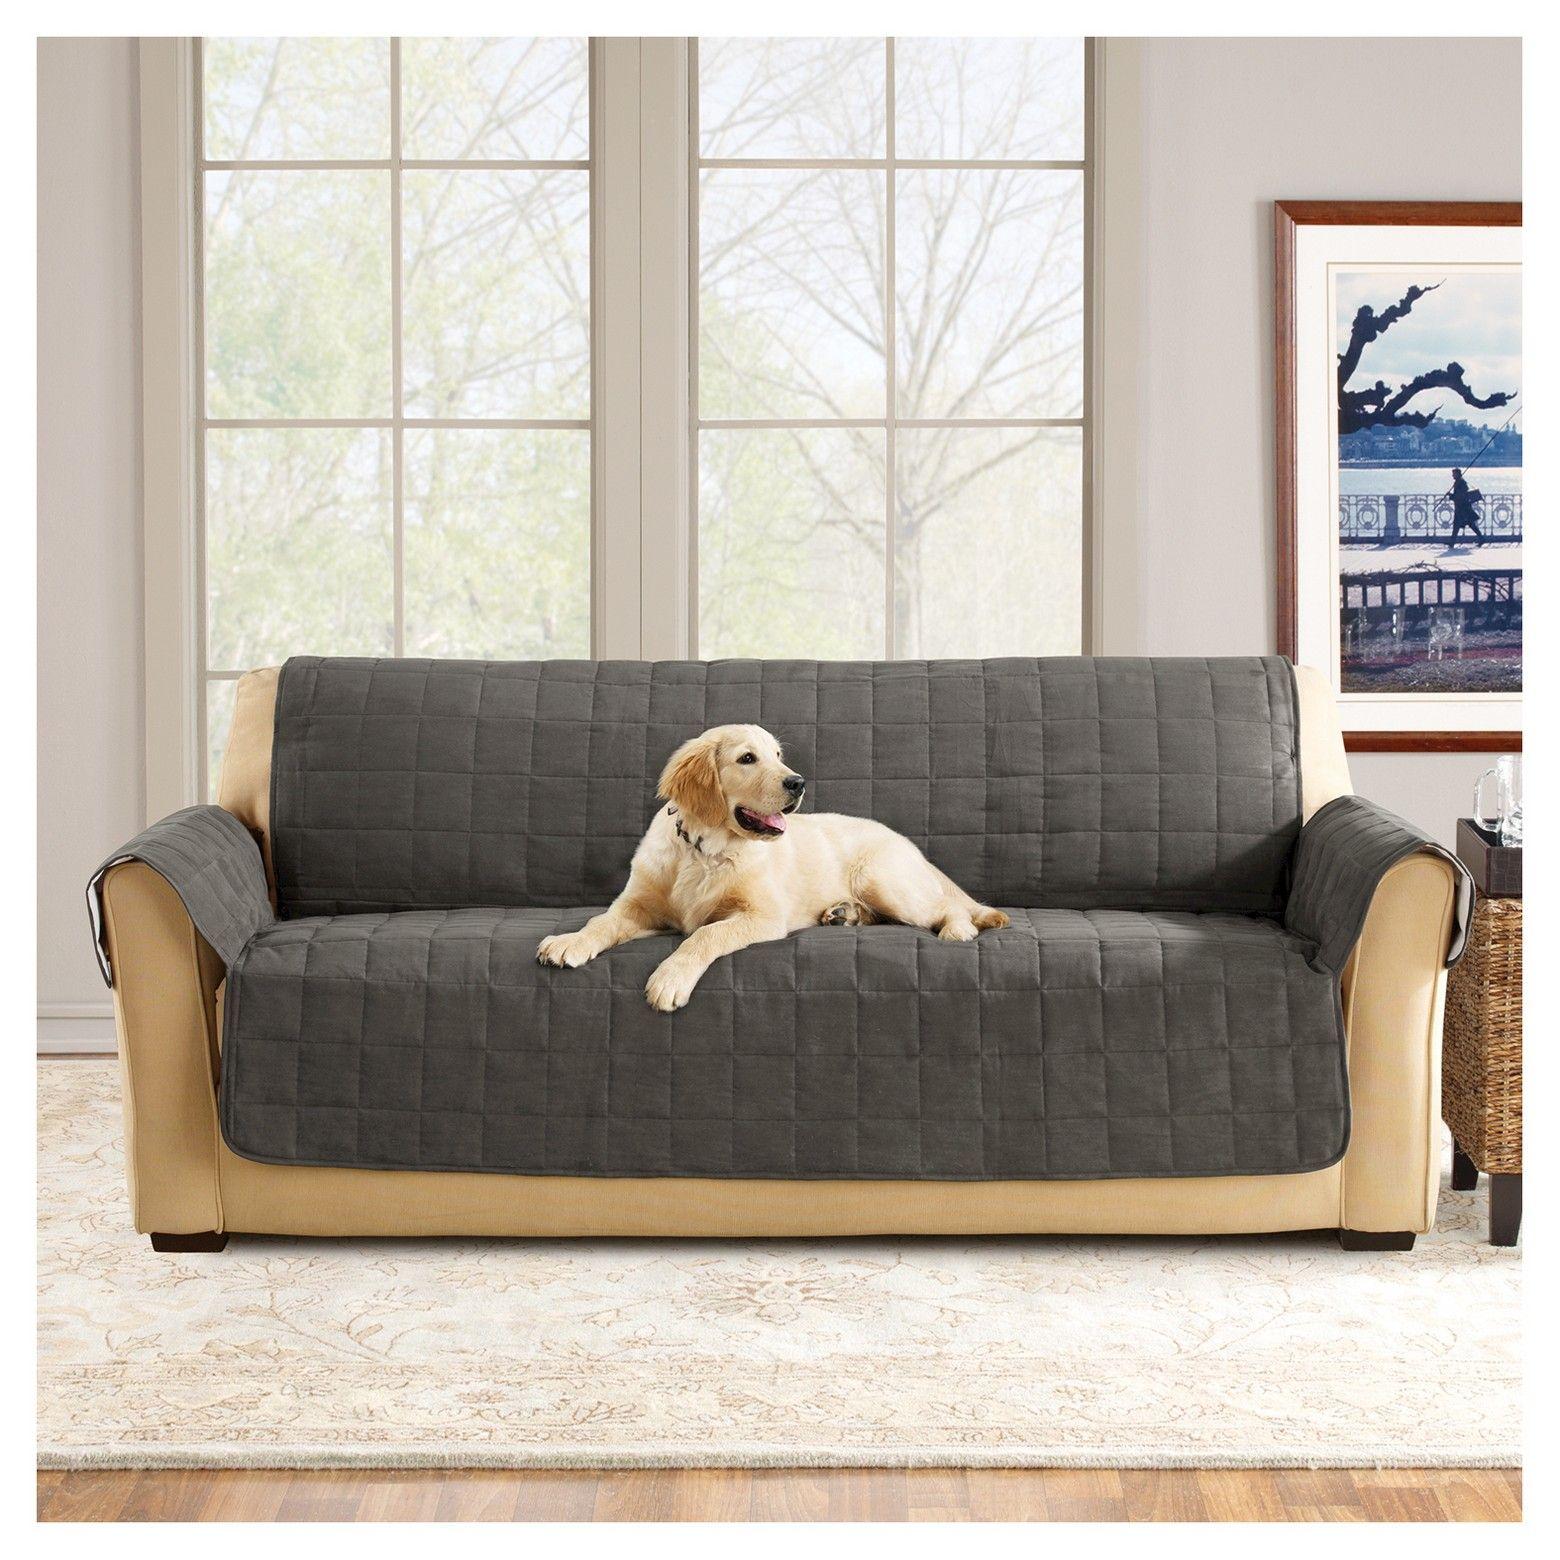 The Sure Fit Ultimate Waterproof Suede Sofa Furniture